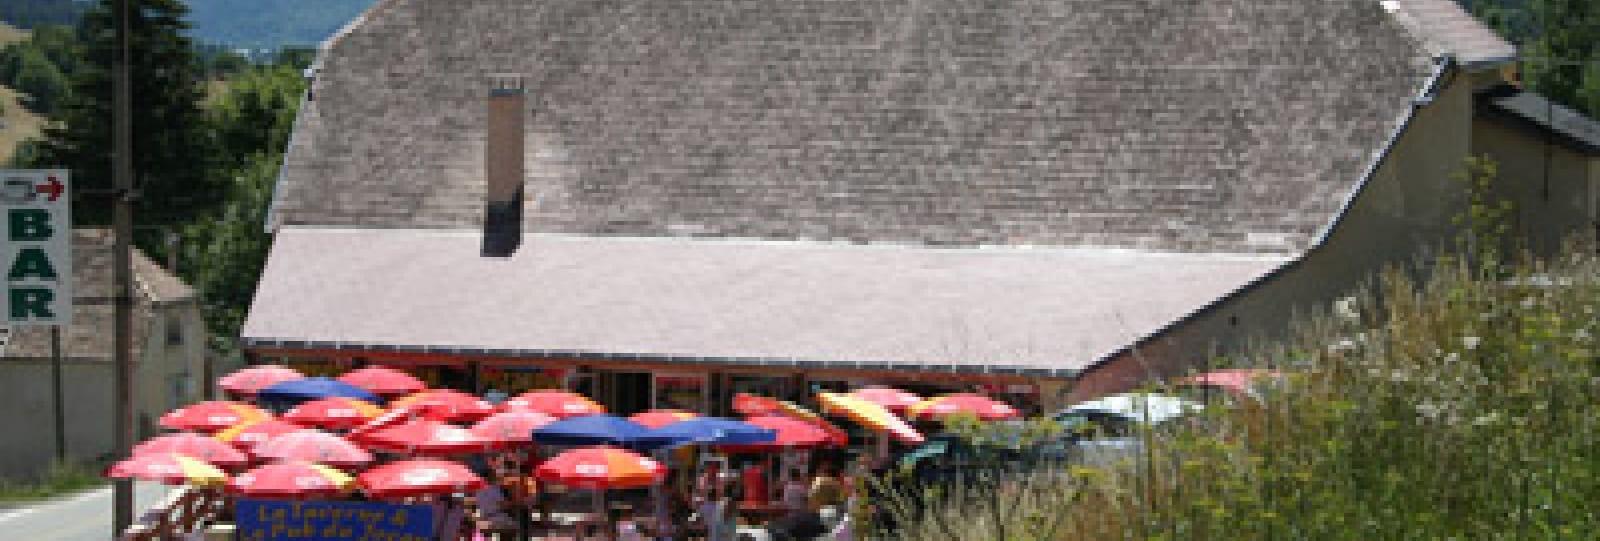 La Taverne du Jocou